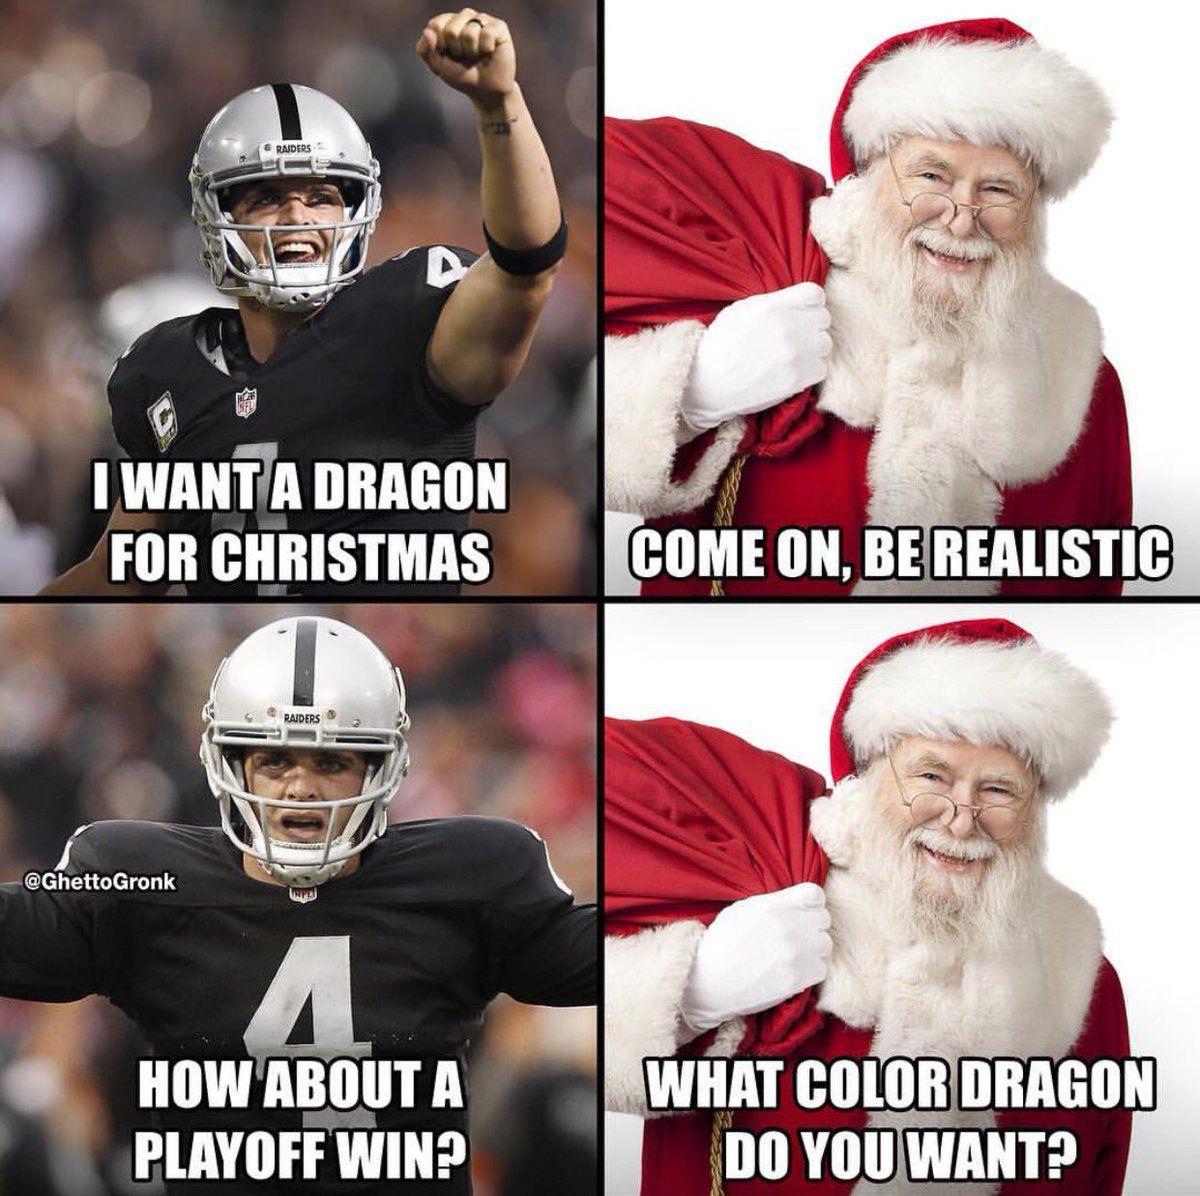 Nfl Memes Nflmemes4you Twitter Nfl Memes Funny Funny Football Memes Nfl Funny